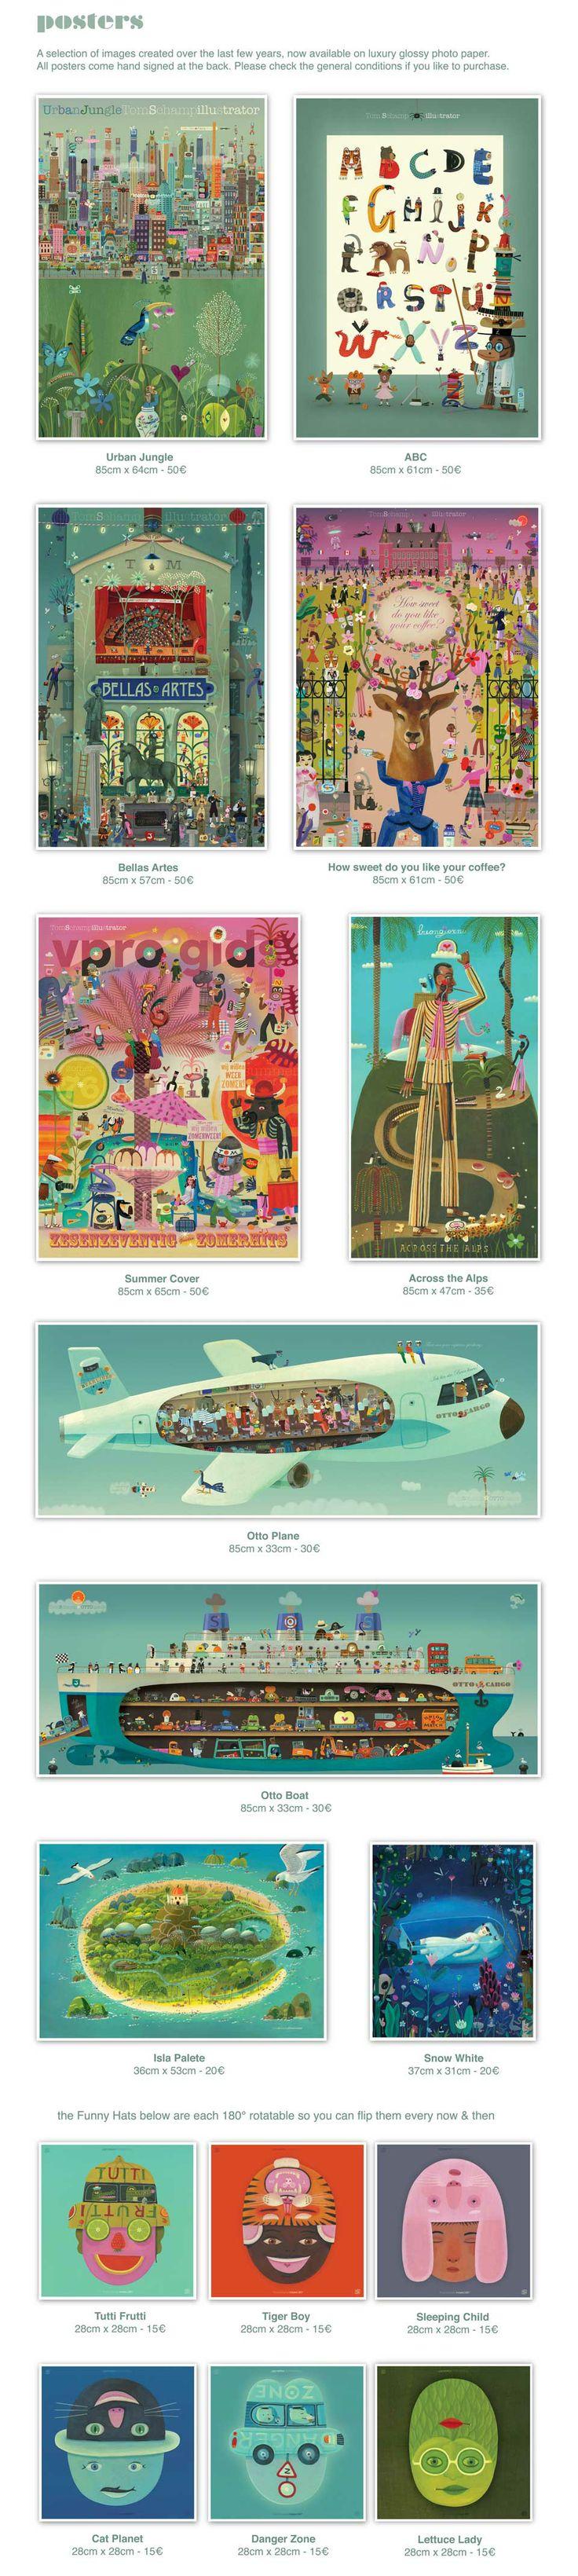 Tom Schamp | Posters